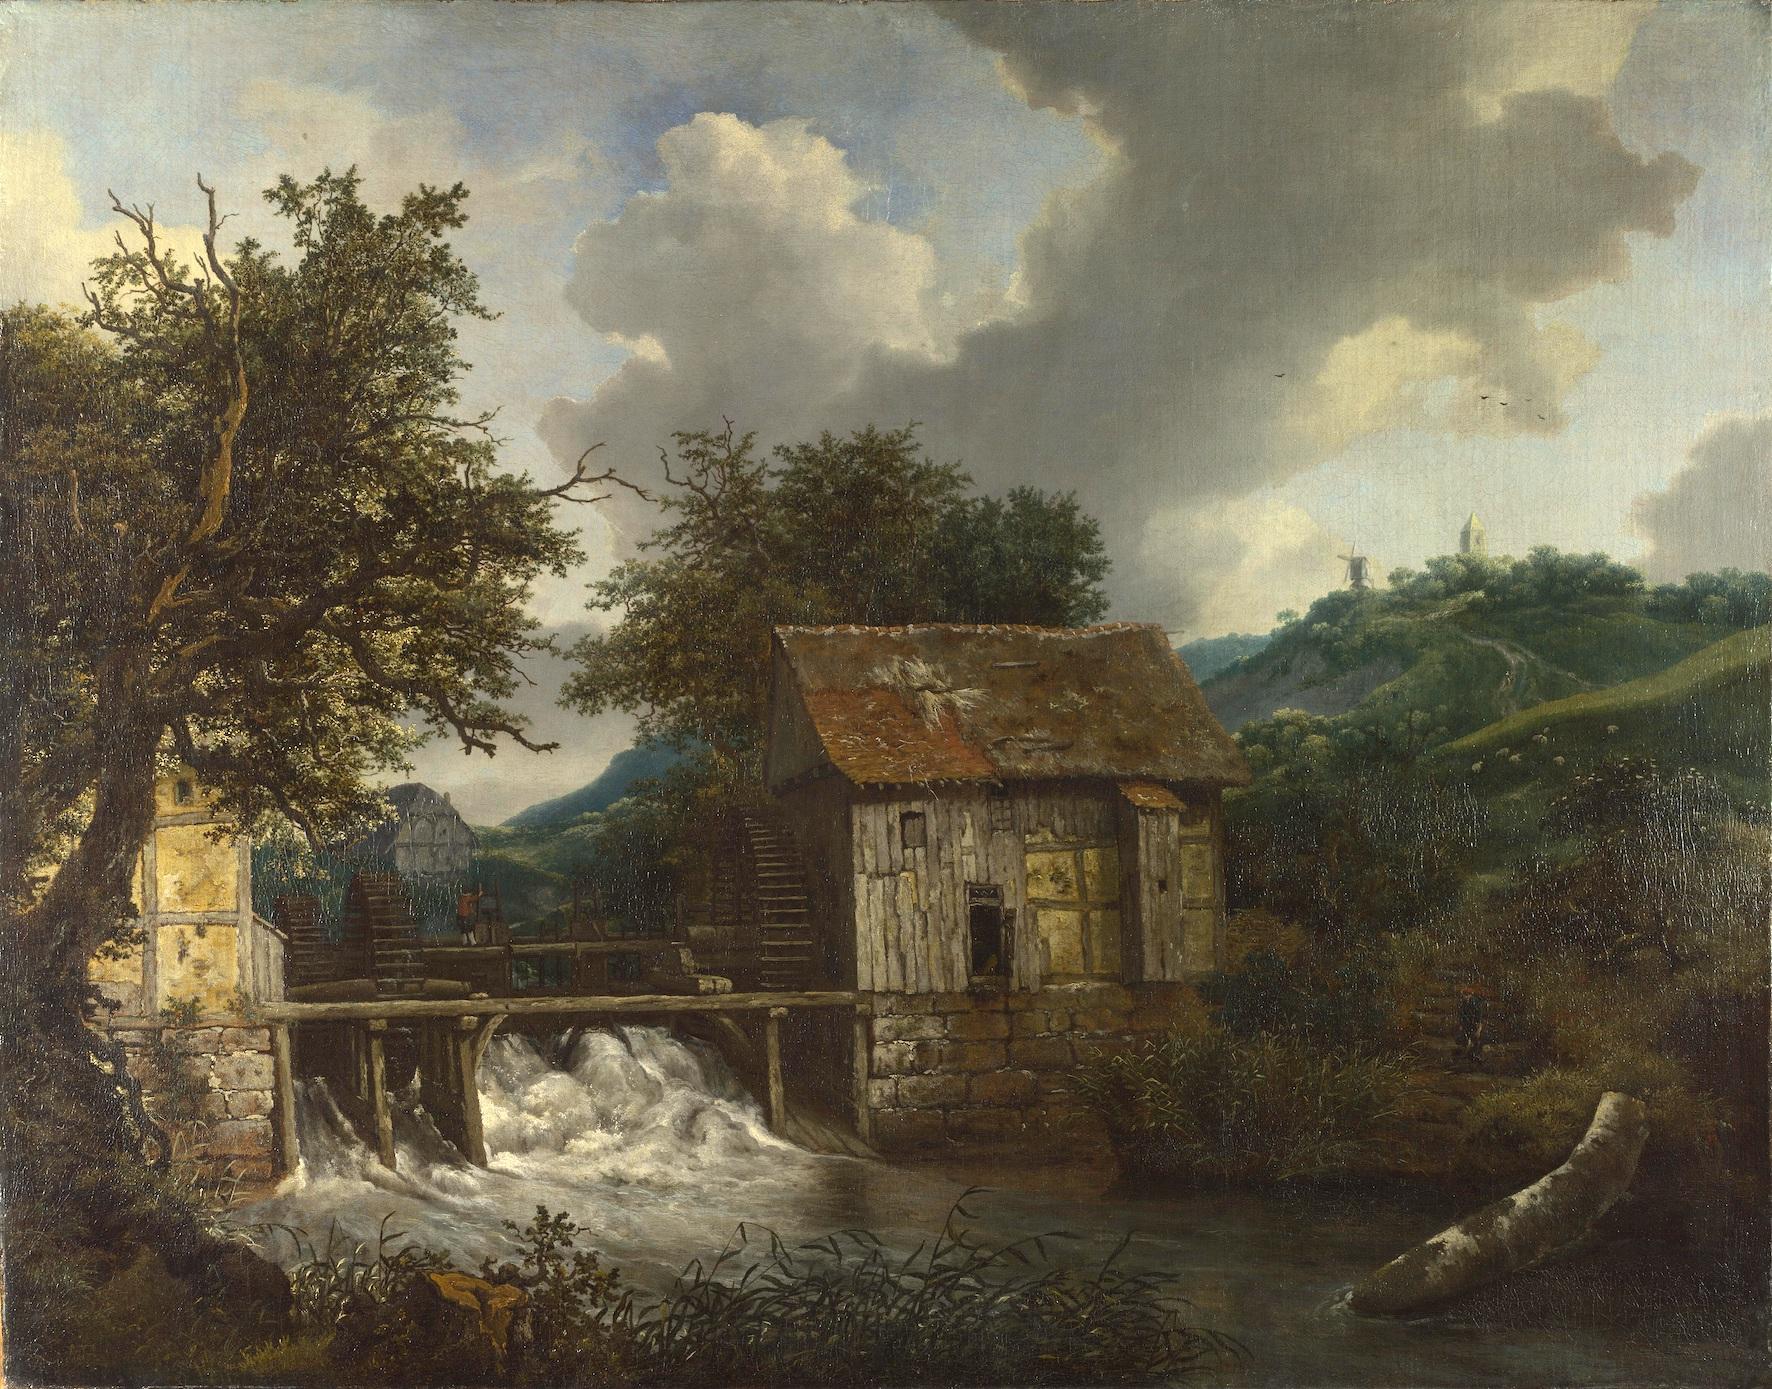 Jacob_Isaacksz._van_Ruisdael_-_Two_Watermills_and_an_Open_Sluice_near_Singraven